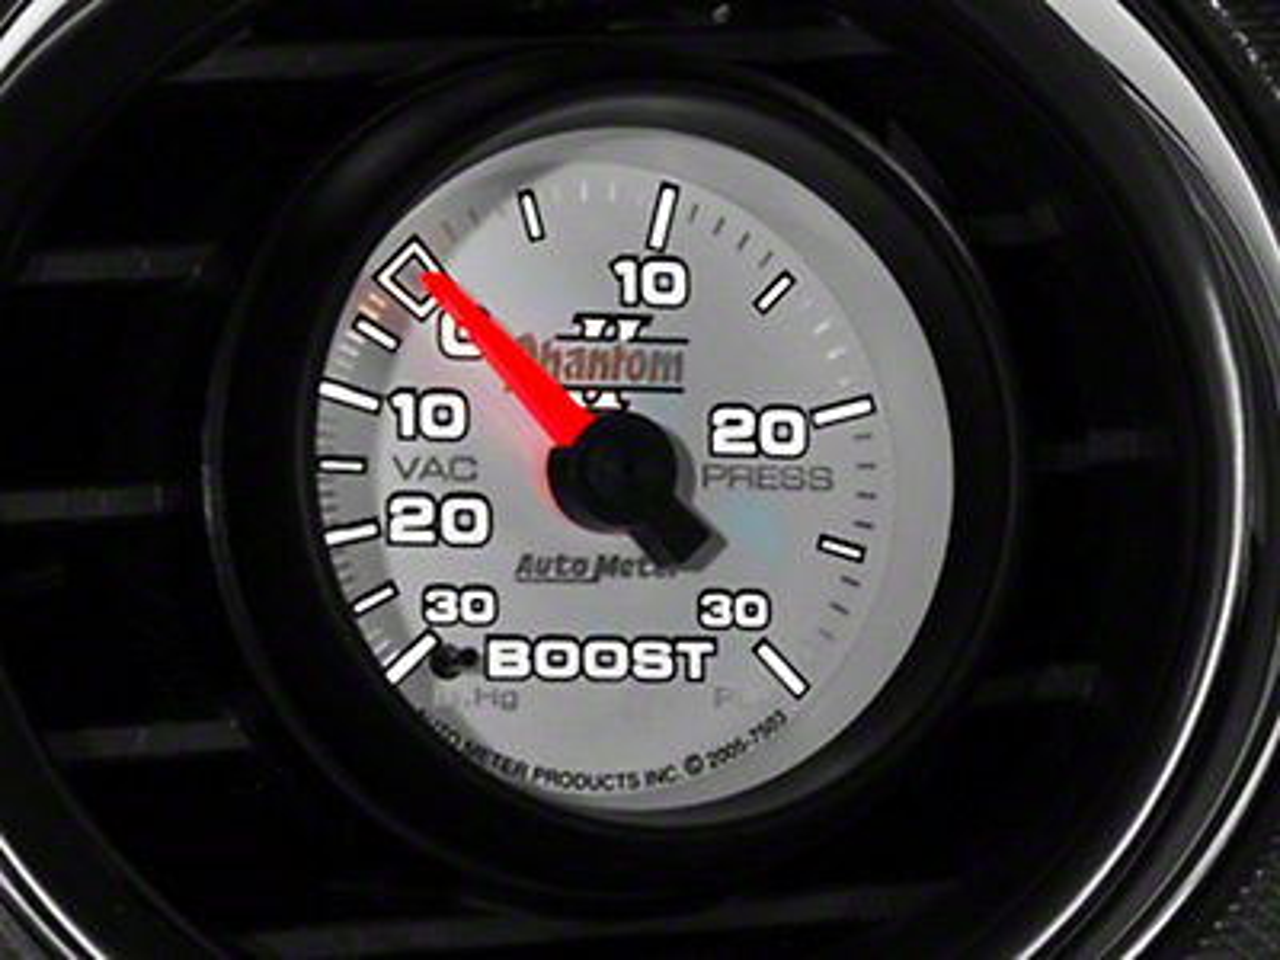 Auto Meter Phantom II Boost/Vac Gauge - 30 psi Mechanical (79-17 All)